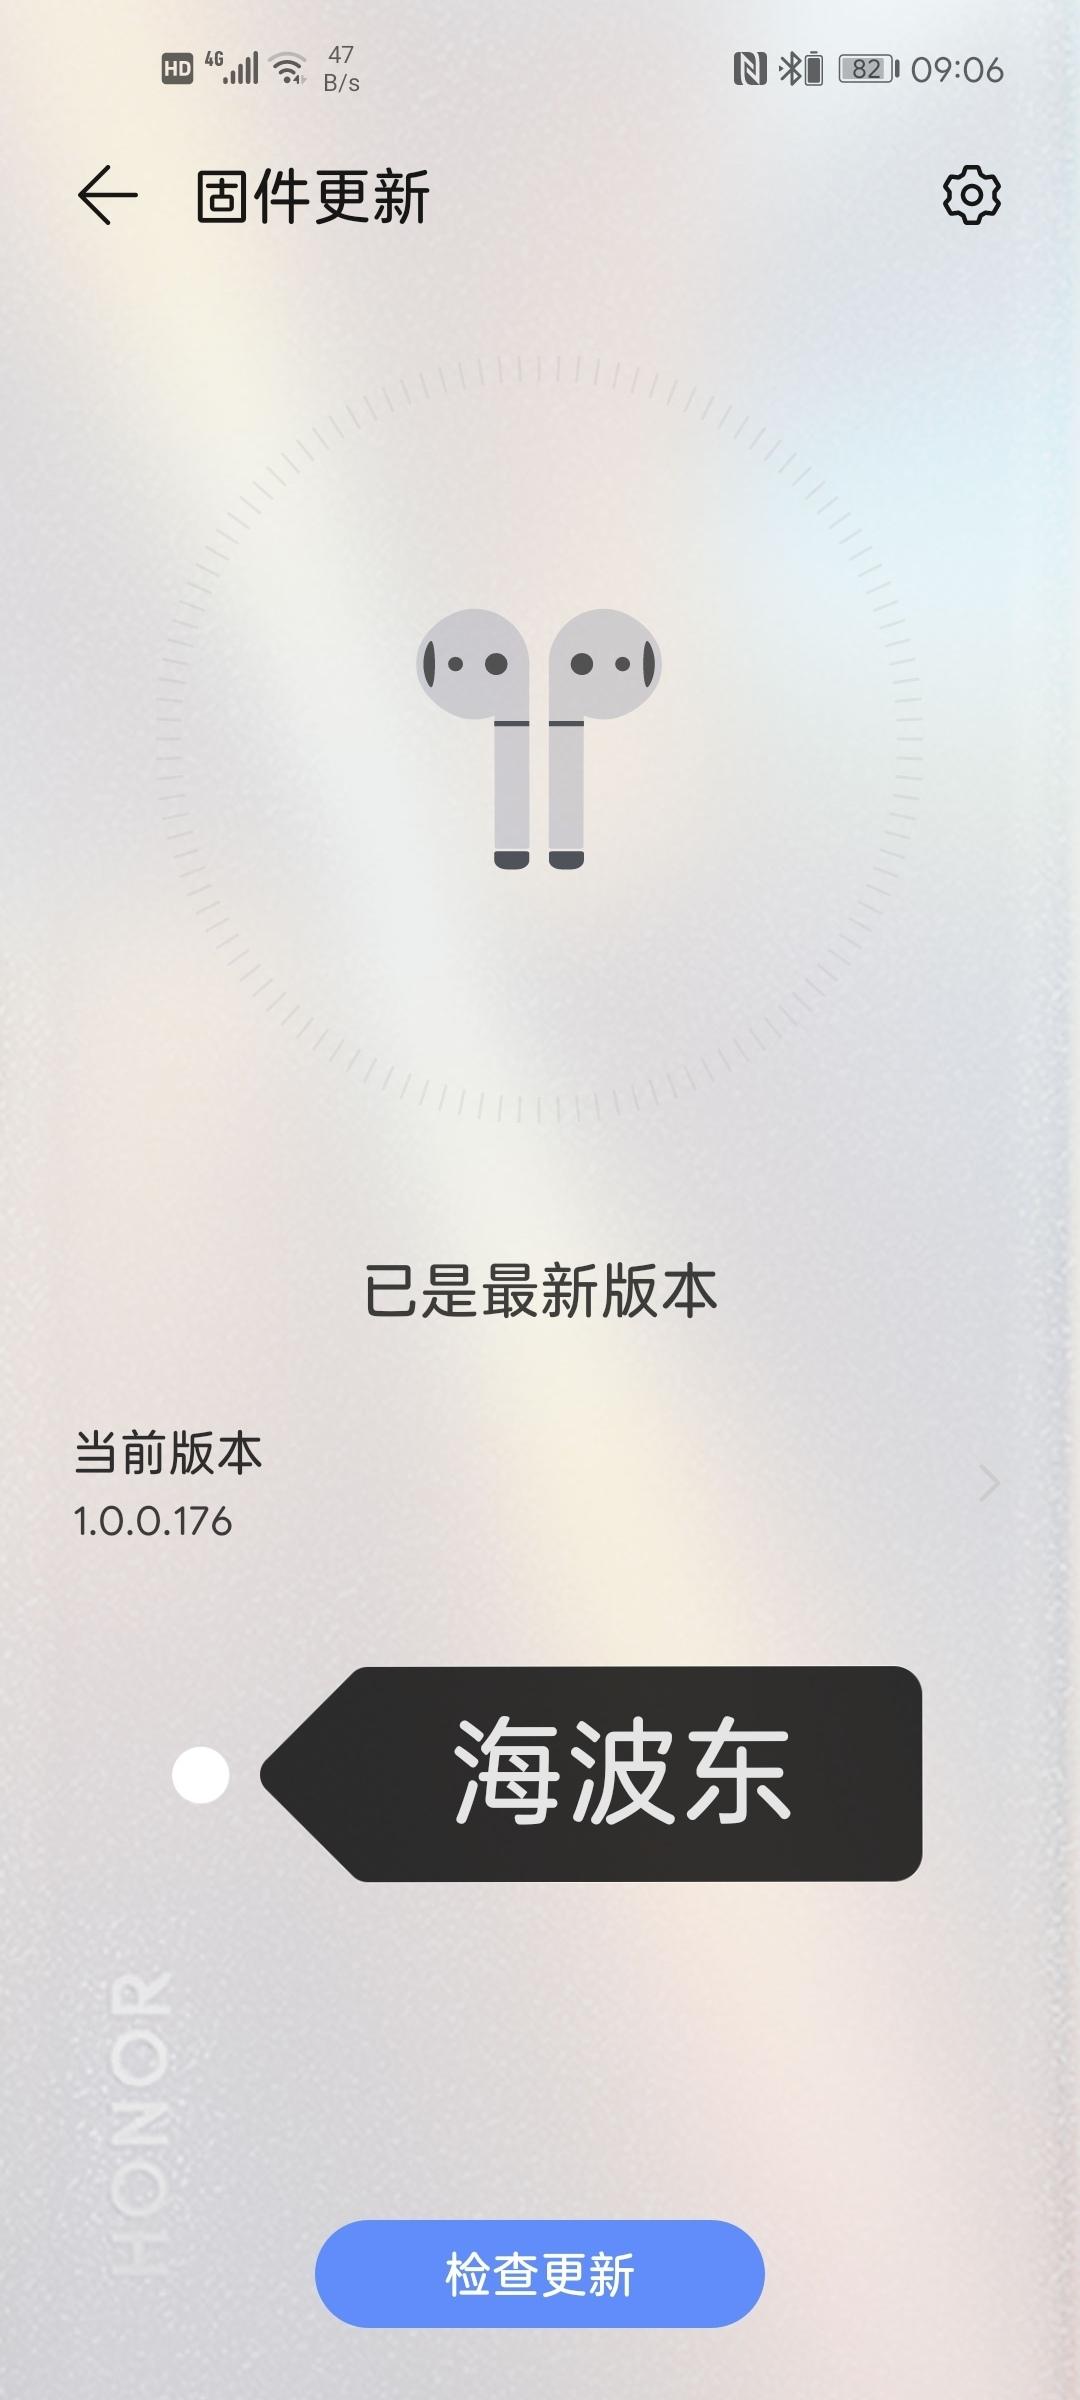 Screenshot_20210706_090614_com.huawei.android.hwouc_edit_544712300763237.jpg